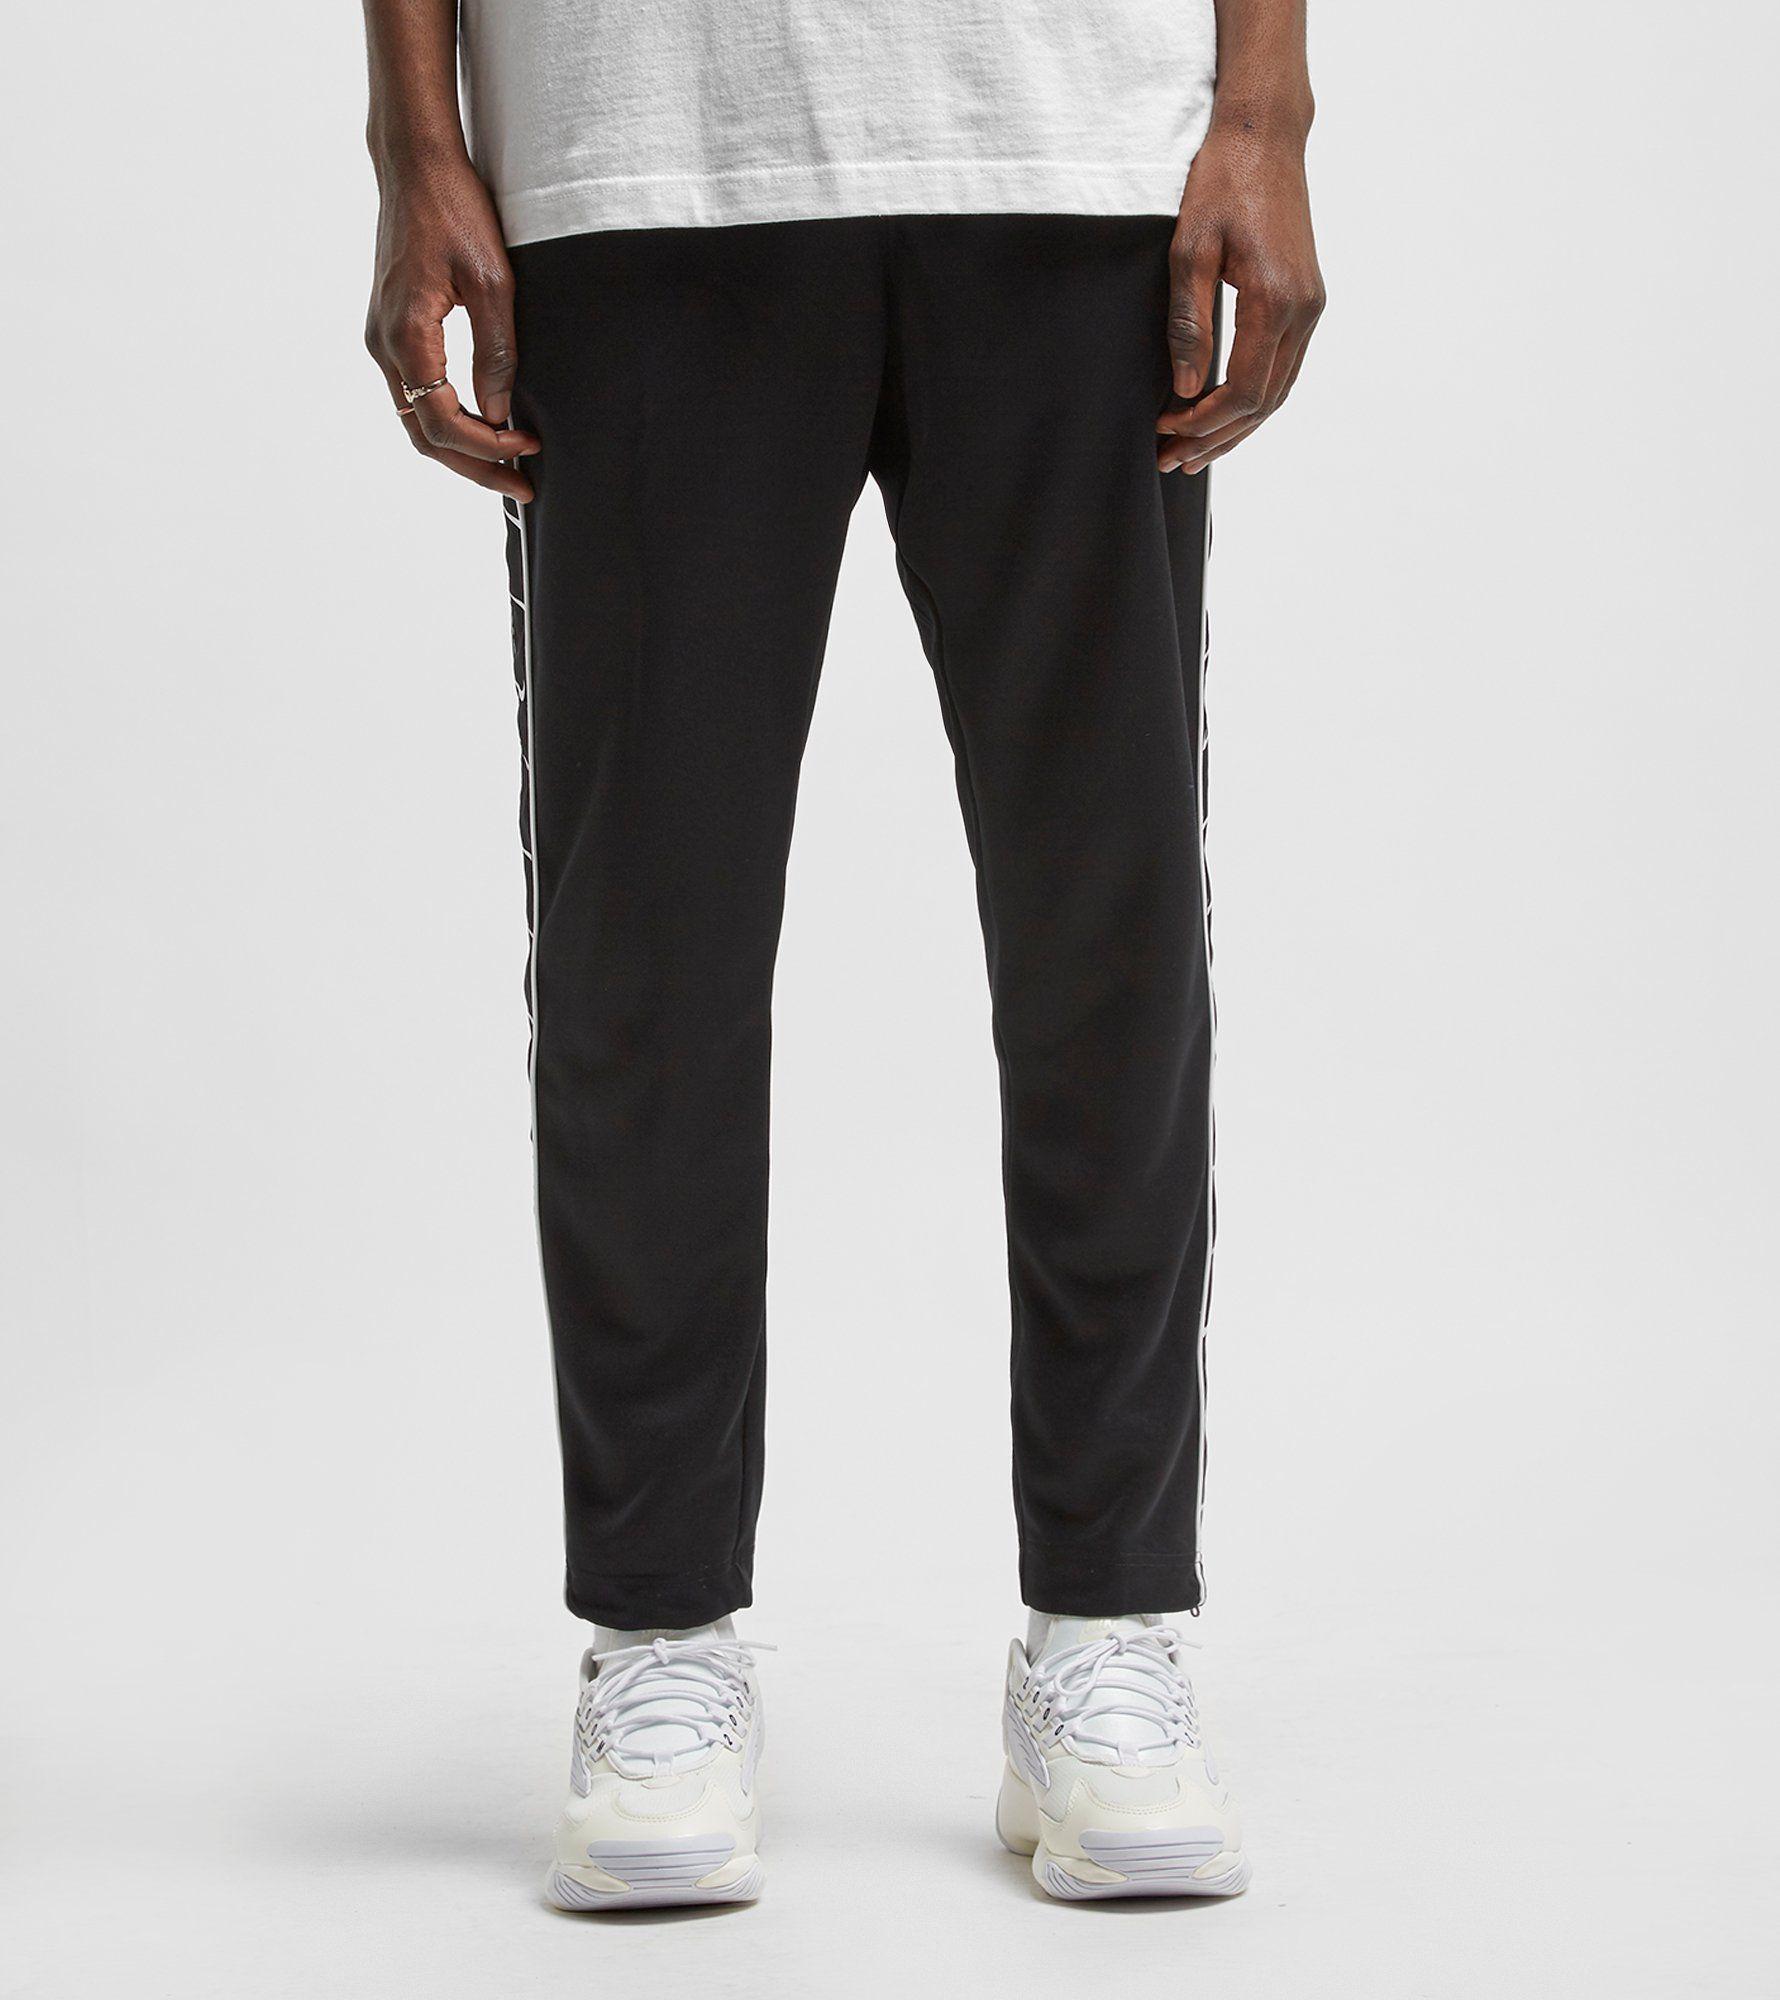 De Pantalon Pantalon SurvêtementSize Nike SurvêtementSize Nike De Nike Pantalon 5jL4AR3